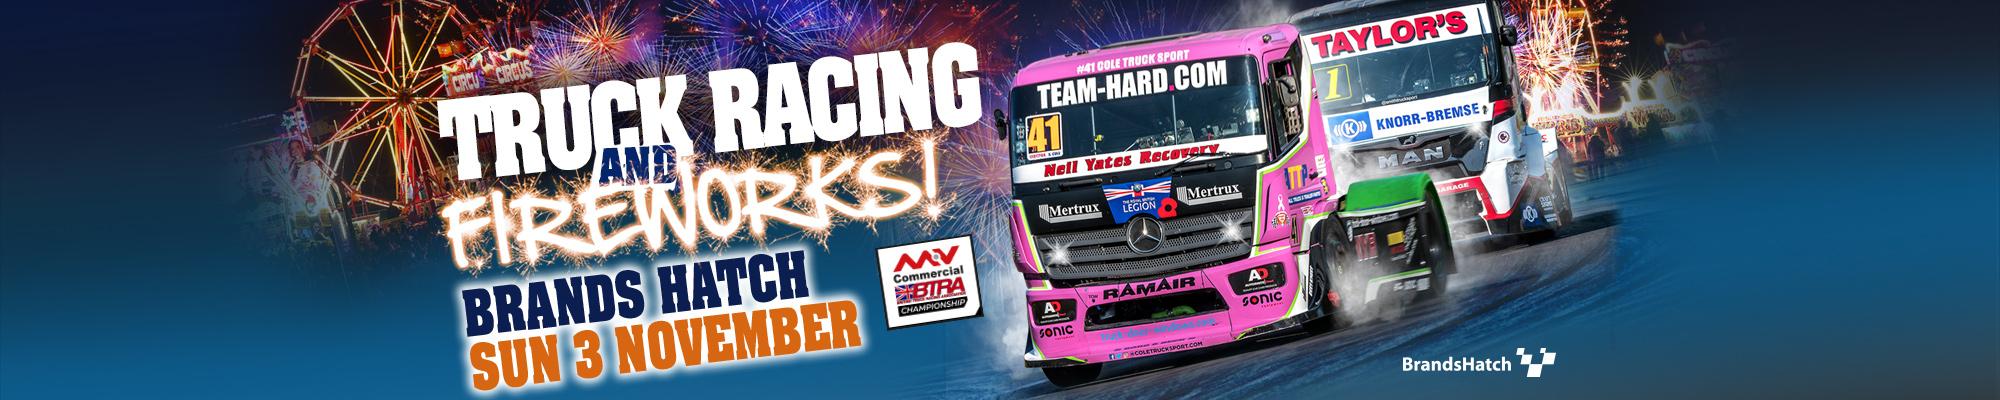 British Truck Racing & Fireworks